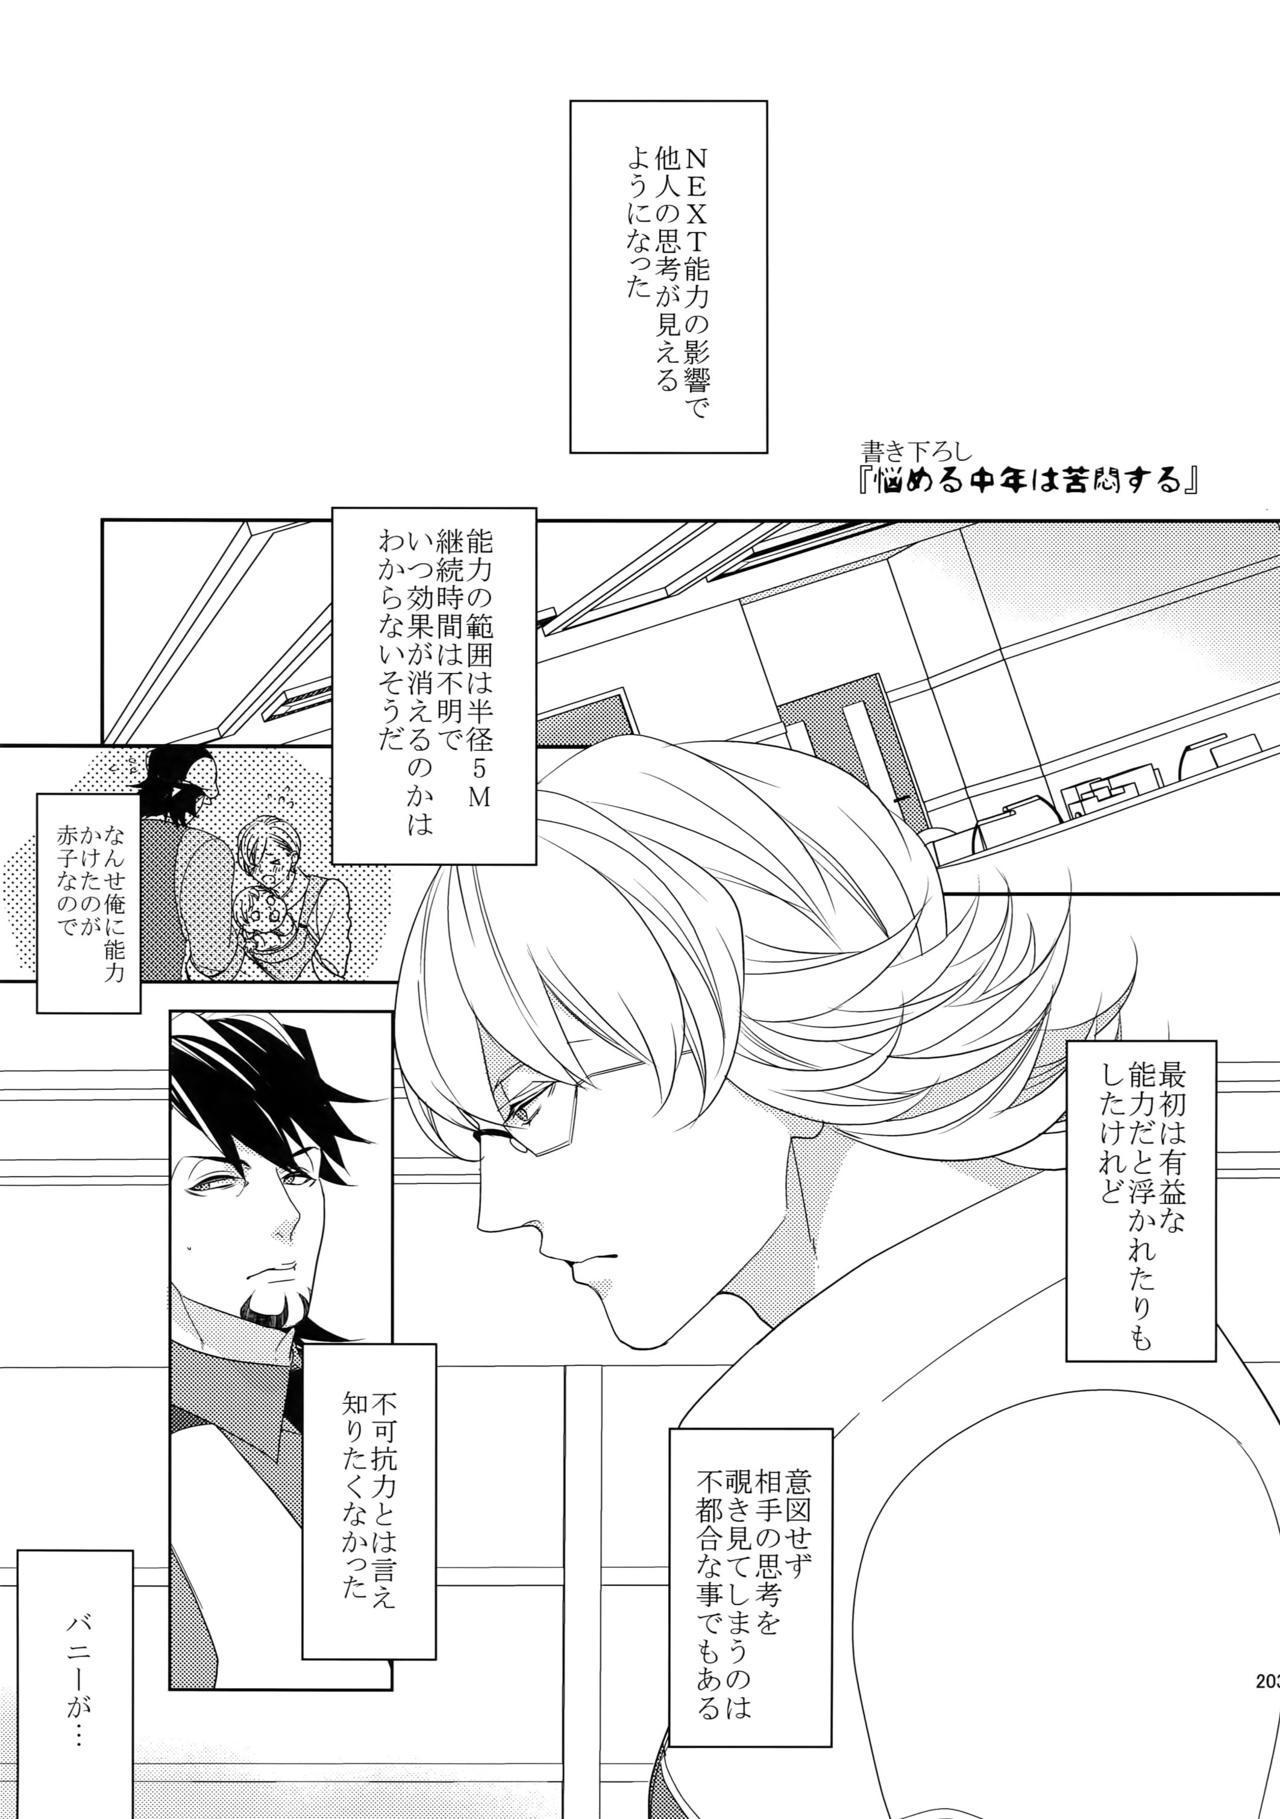 BOROZS Usagi Tora Sairoku 2 201